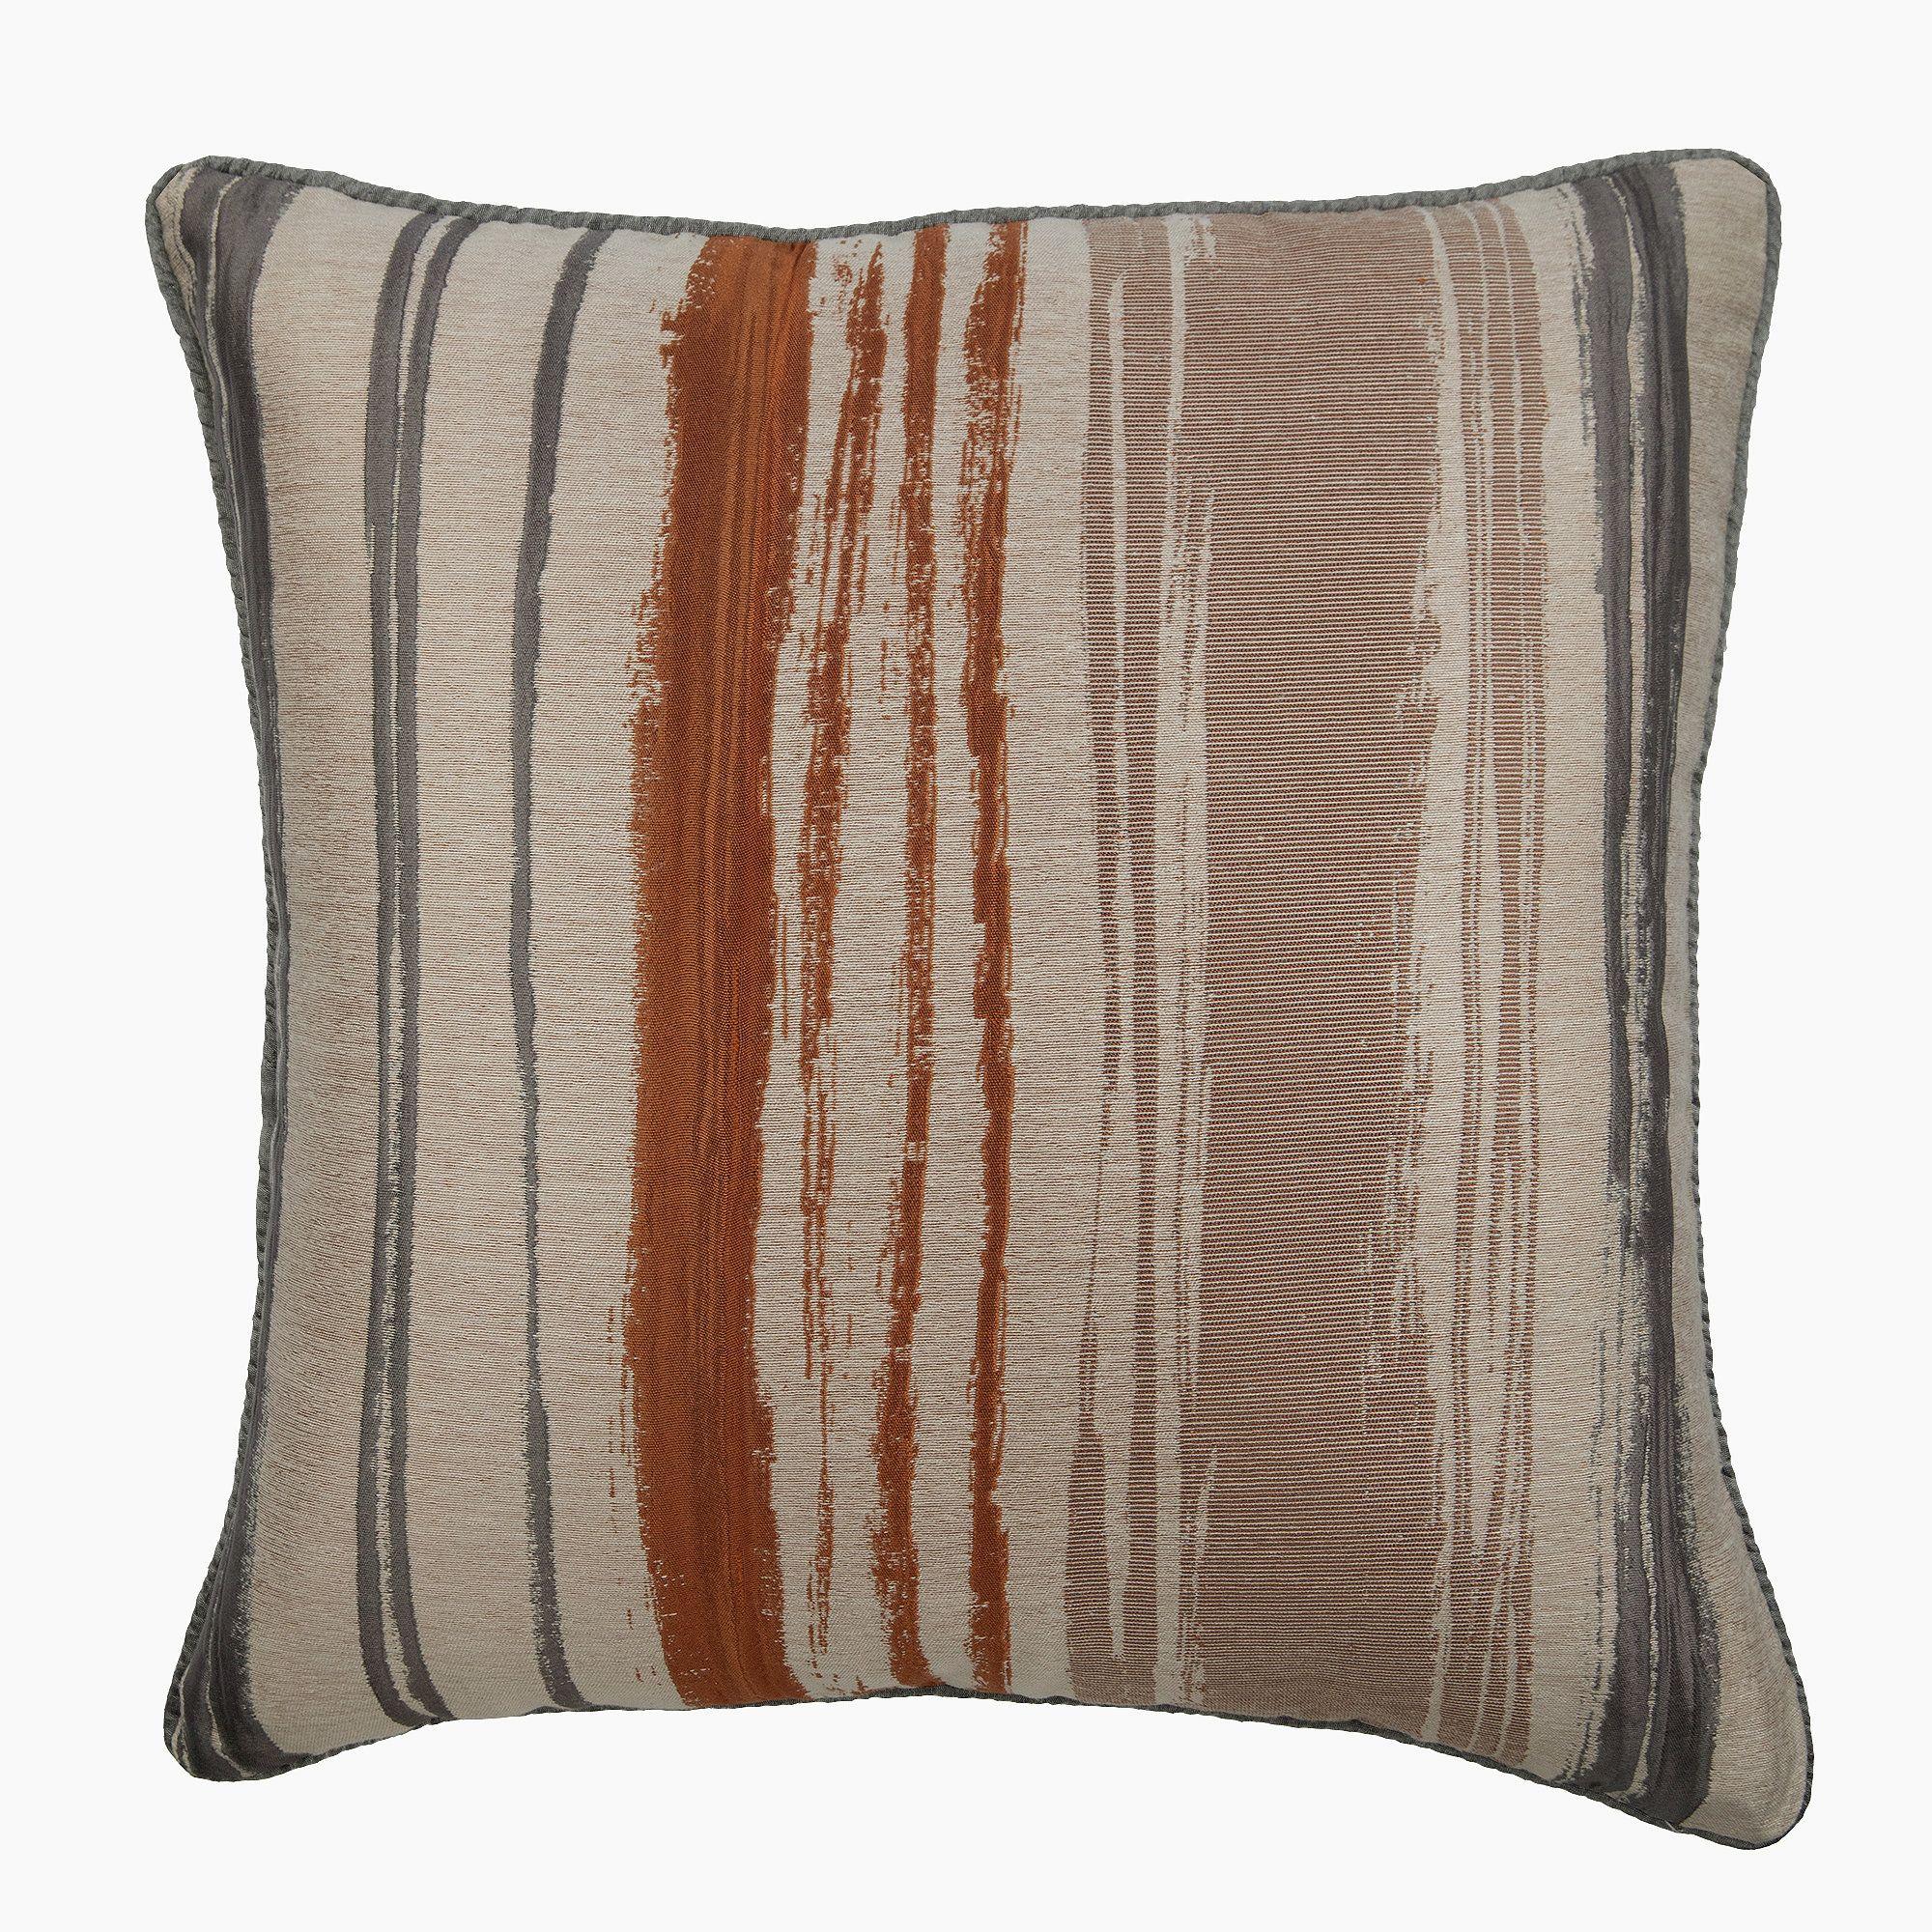 Jacquard Silk Rust Orange Pillow Cases Vintage 16 X16 Luxury